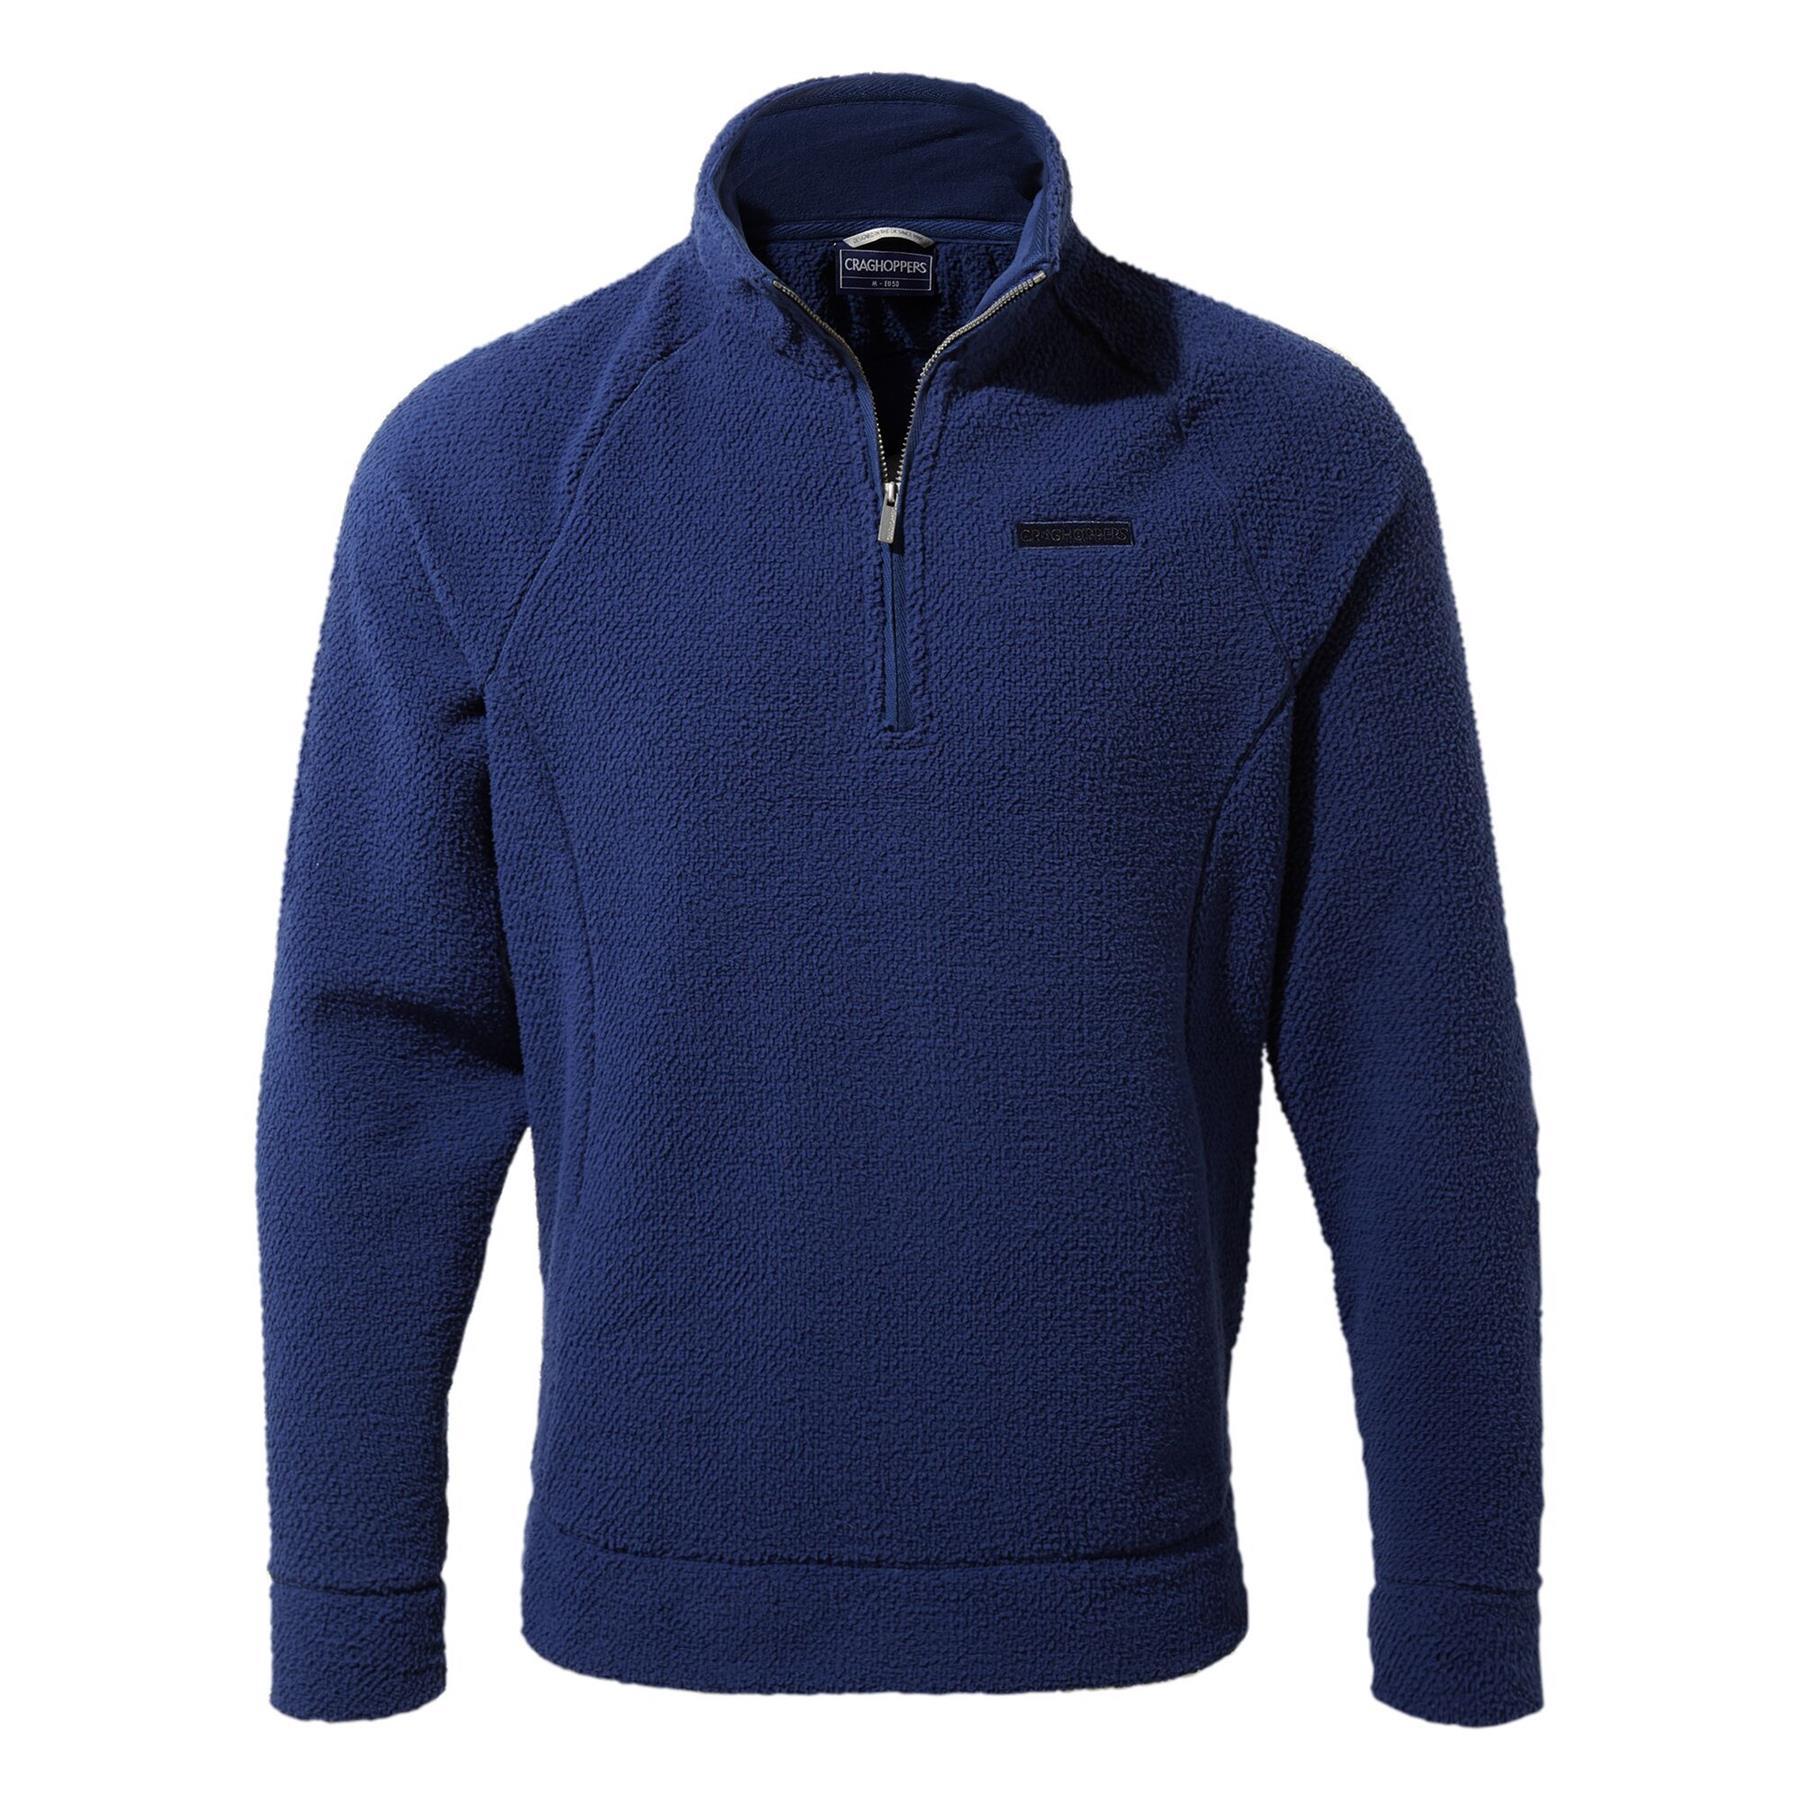 miniatuur 12 - Craghopper Mens Cason Fleece Half Zip Bobble Soft Jumper Pullover Sweater